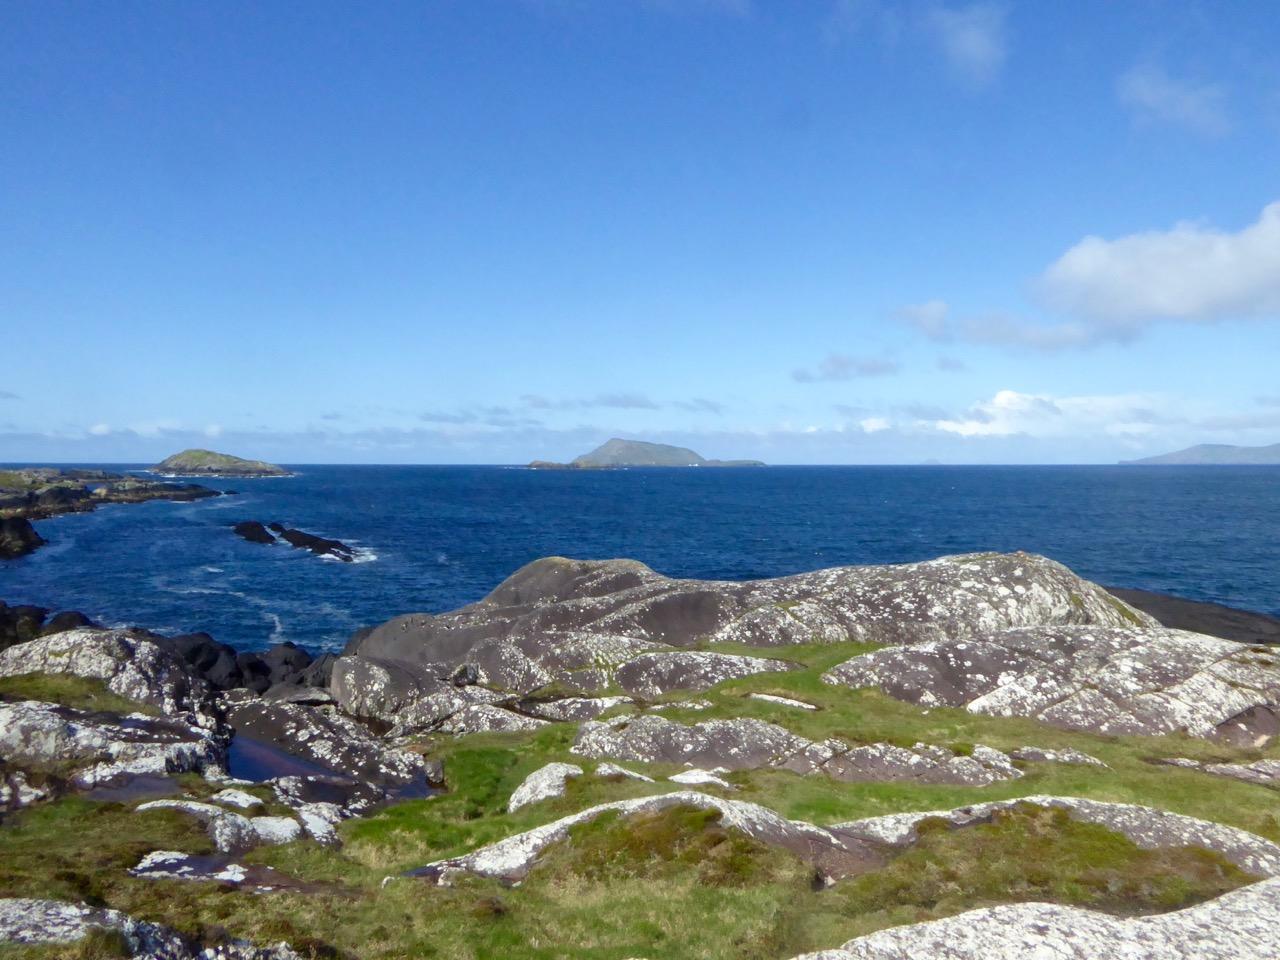 Lamb's Head to Scariff and Deenish Islands